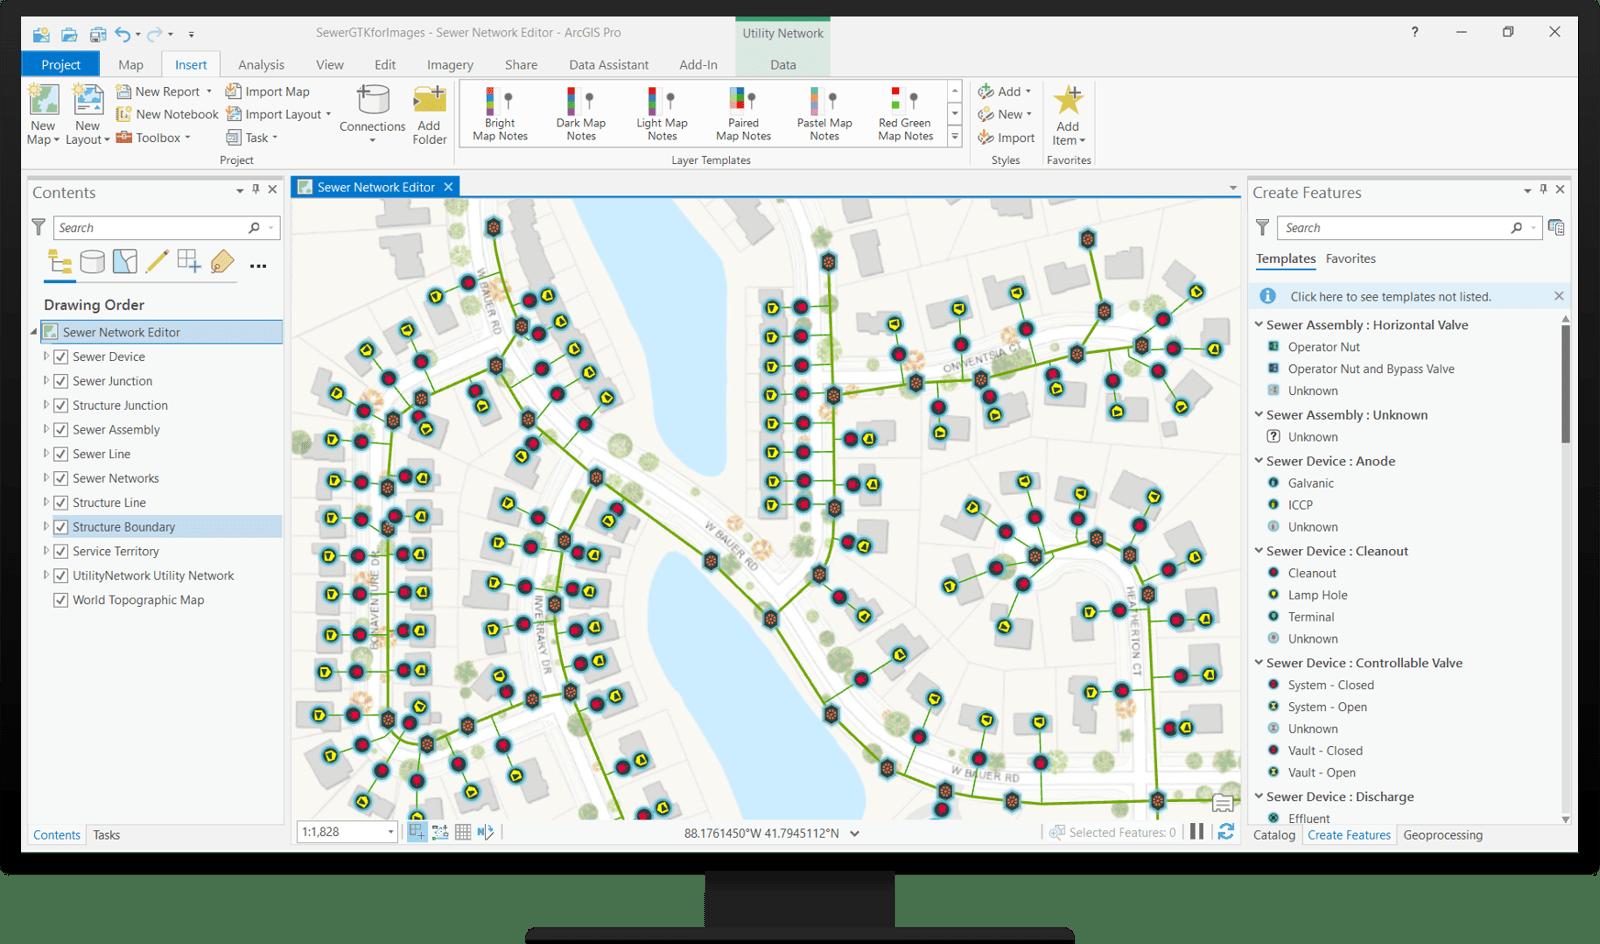 Sewer Editor Map